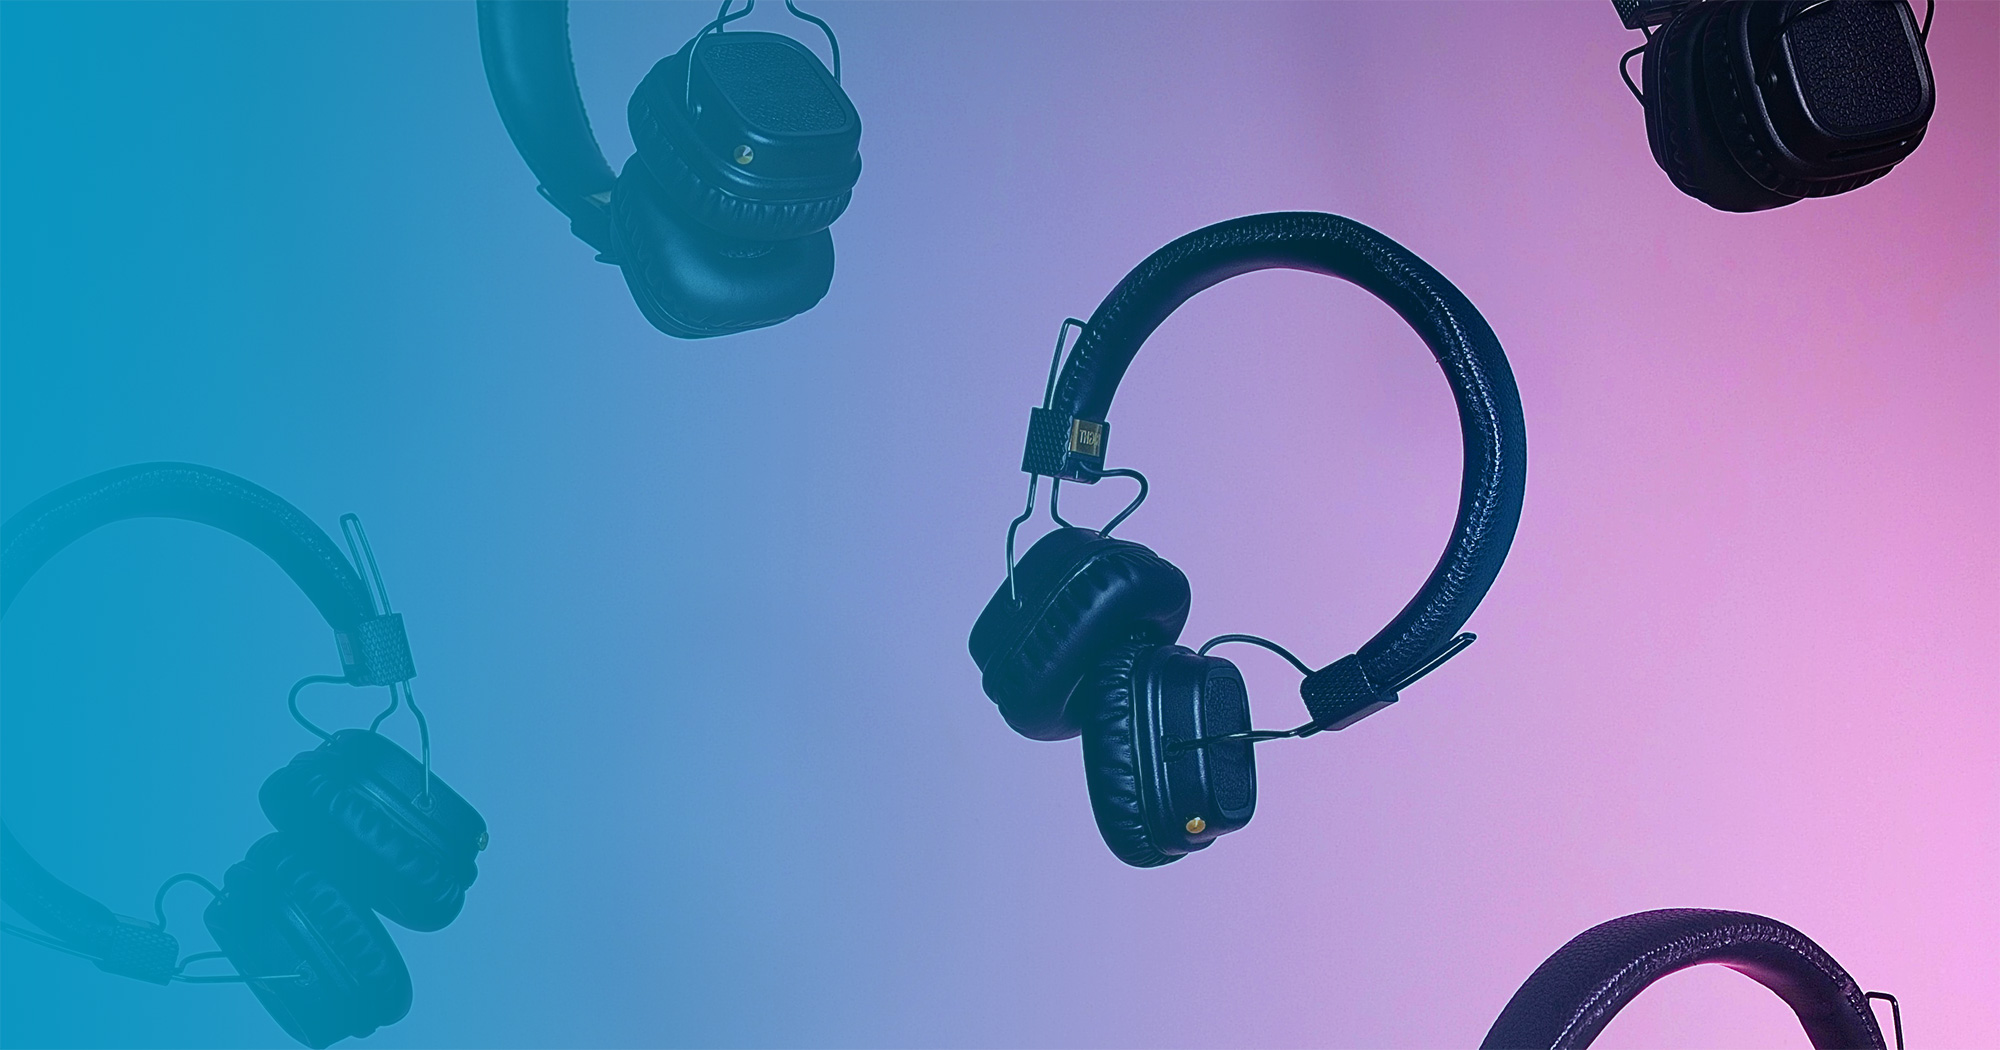 Multiple headphones floating on pink background